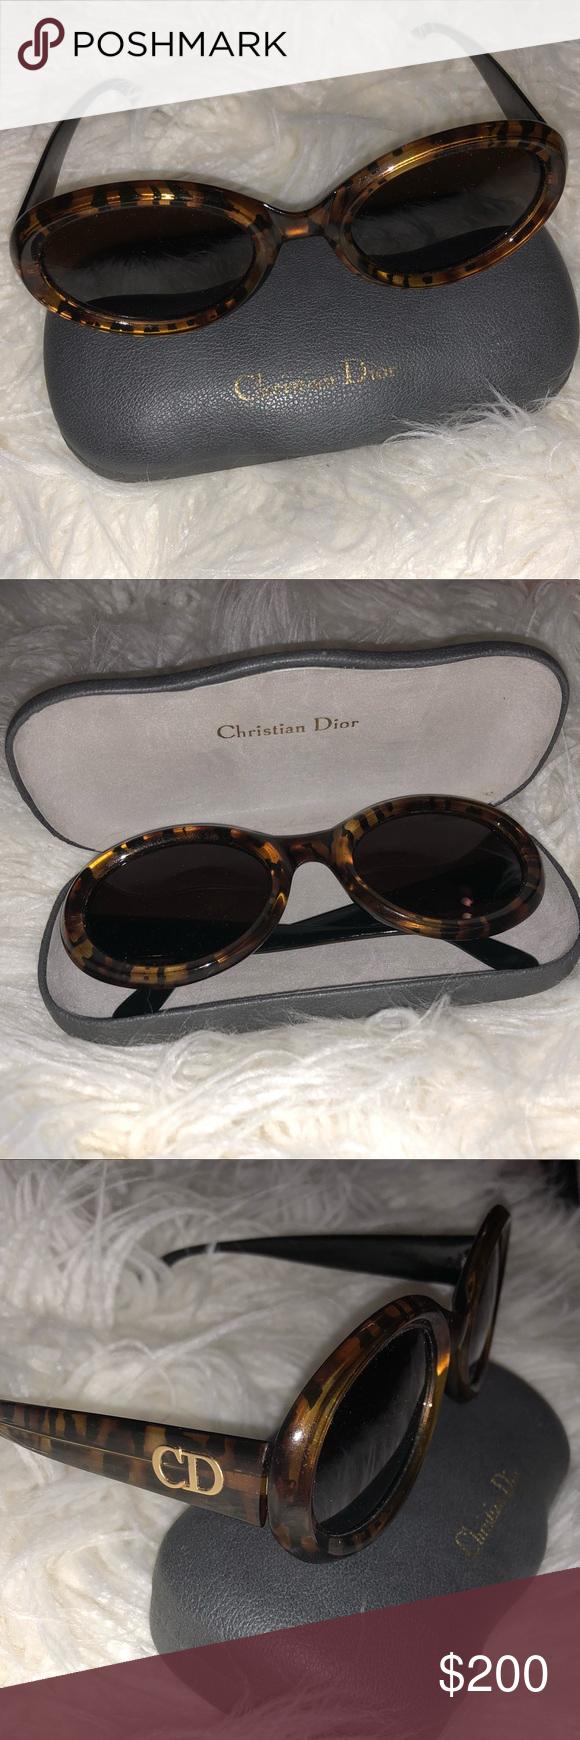 6286c7fdf844 Vintage Christian Dior Sunglasses Beautiful Vintage Dior Sunglasses. In  perfect condition